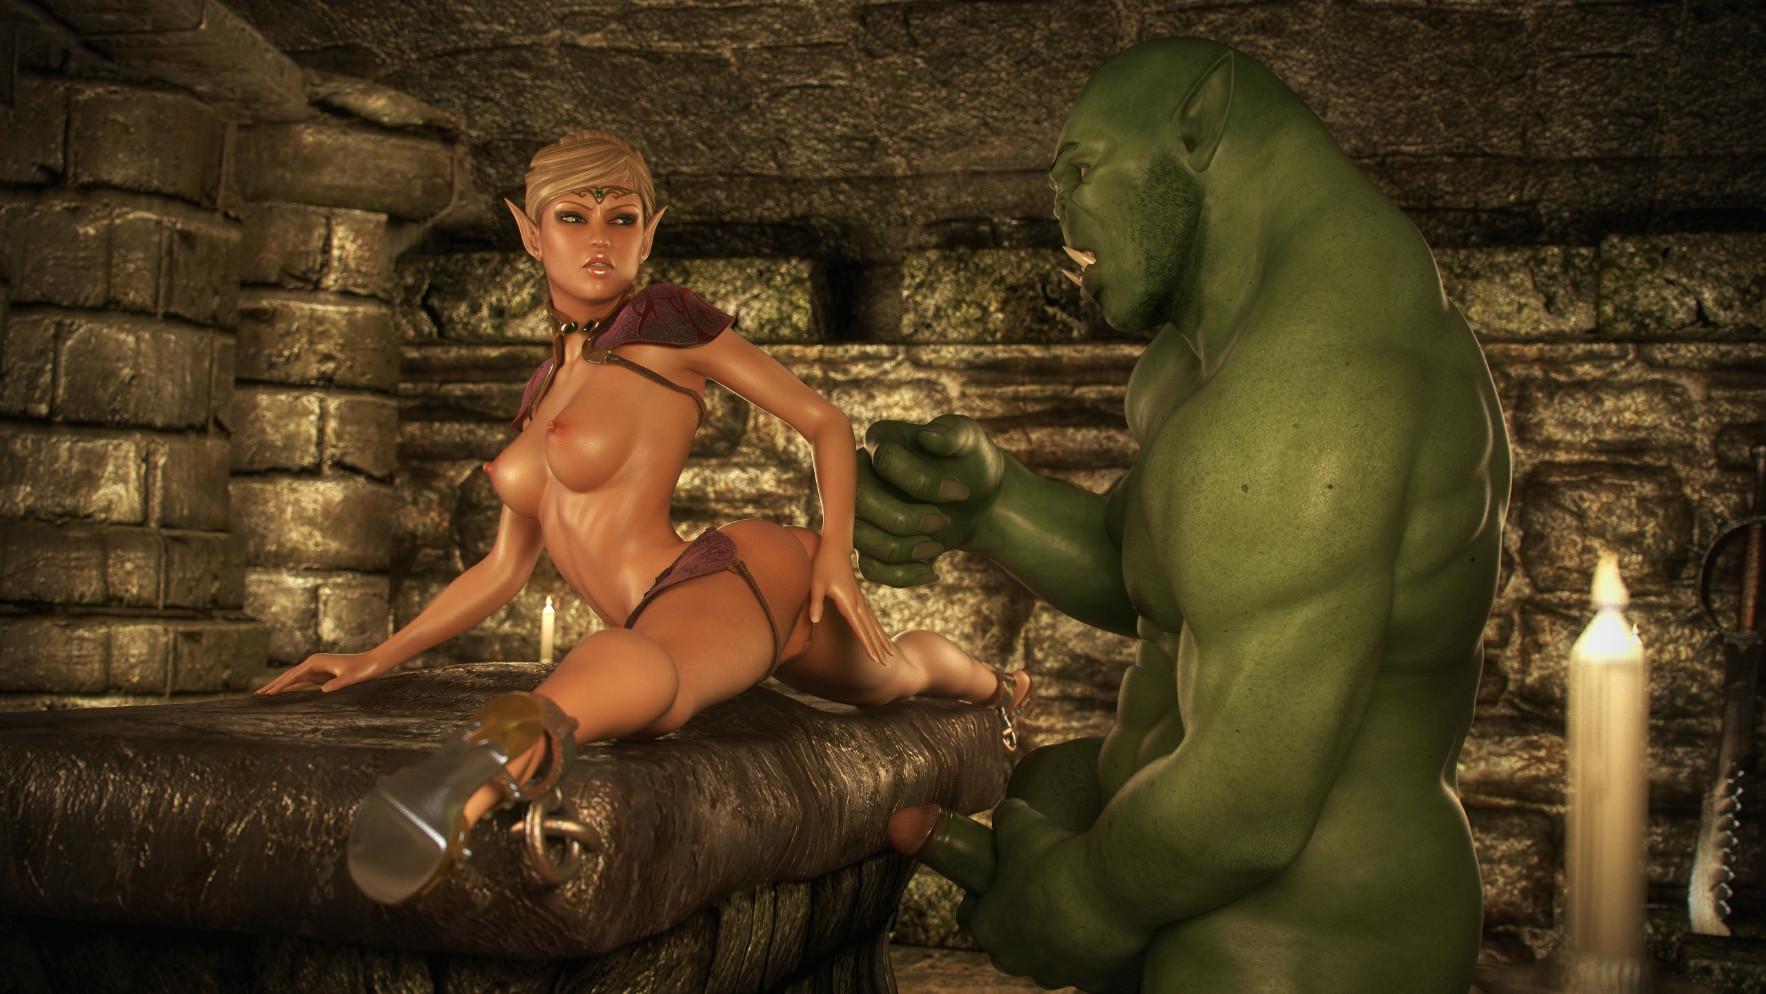 Orc elf monster porn rape video porn pussys